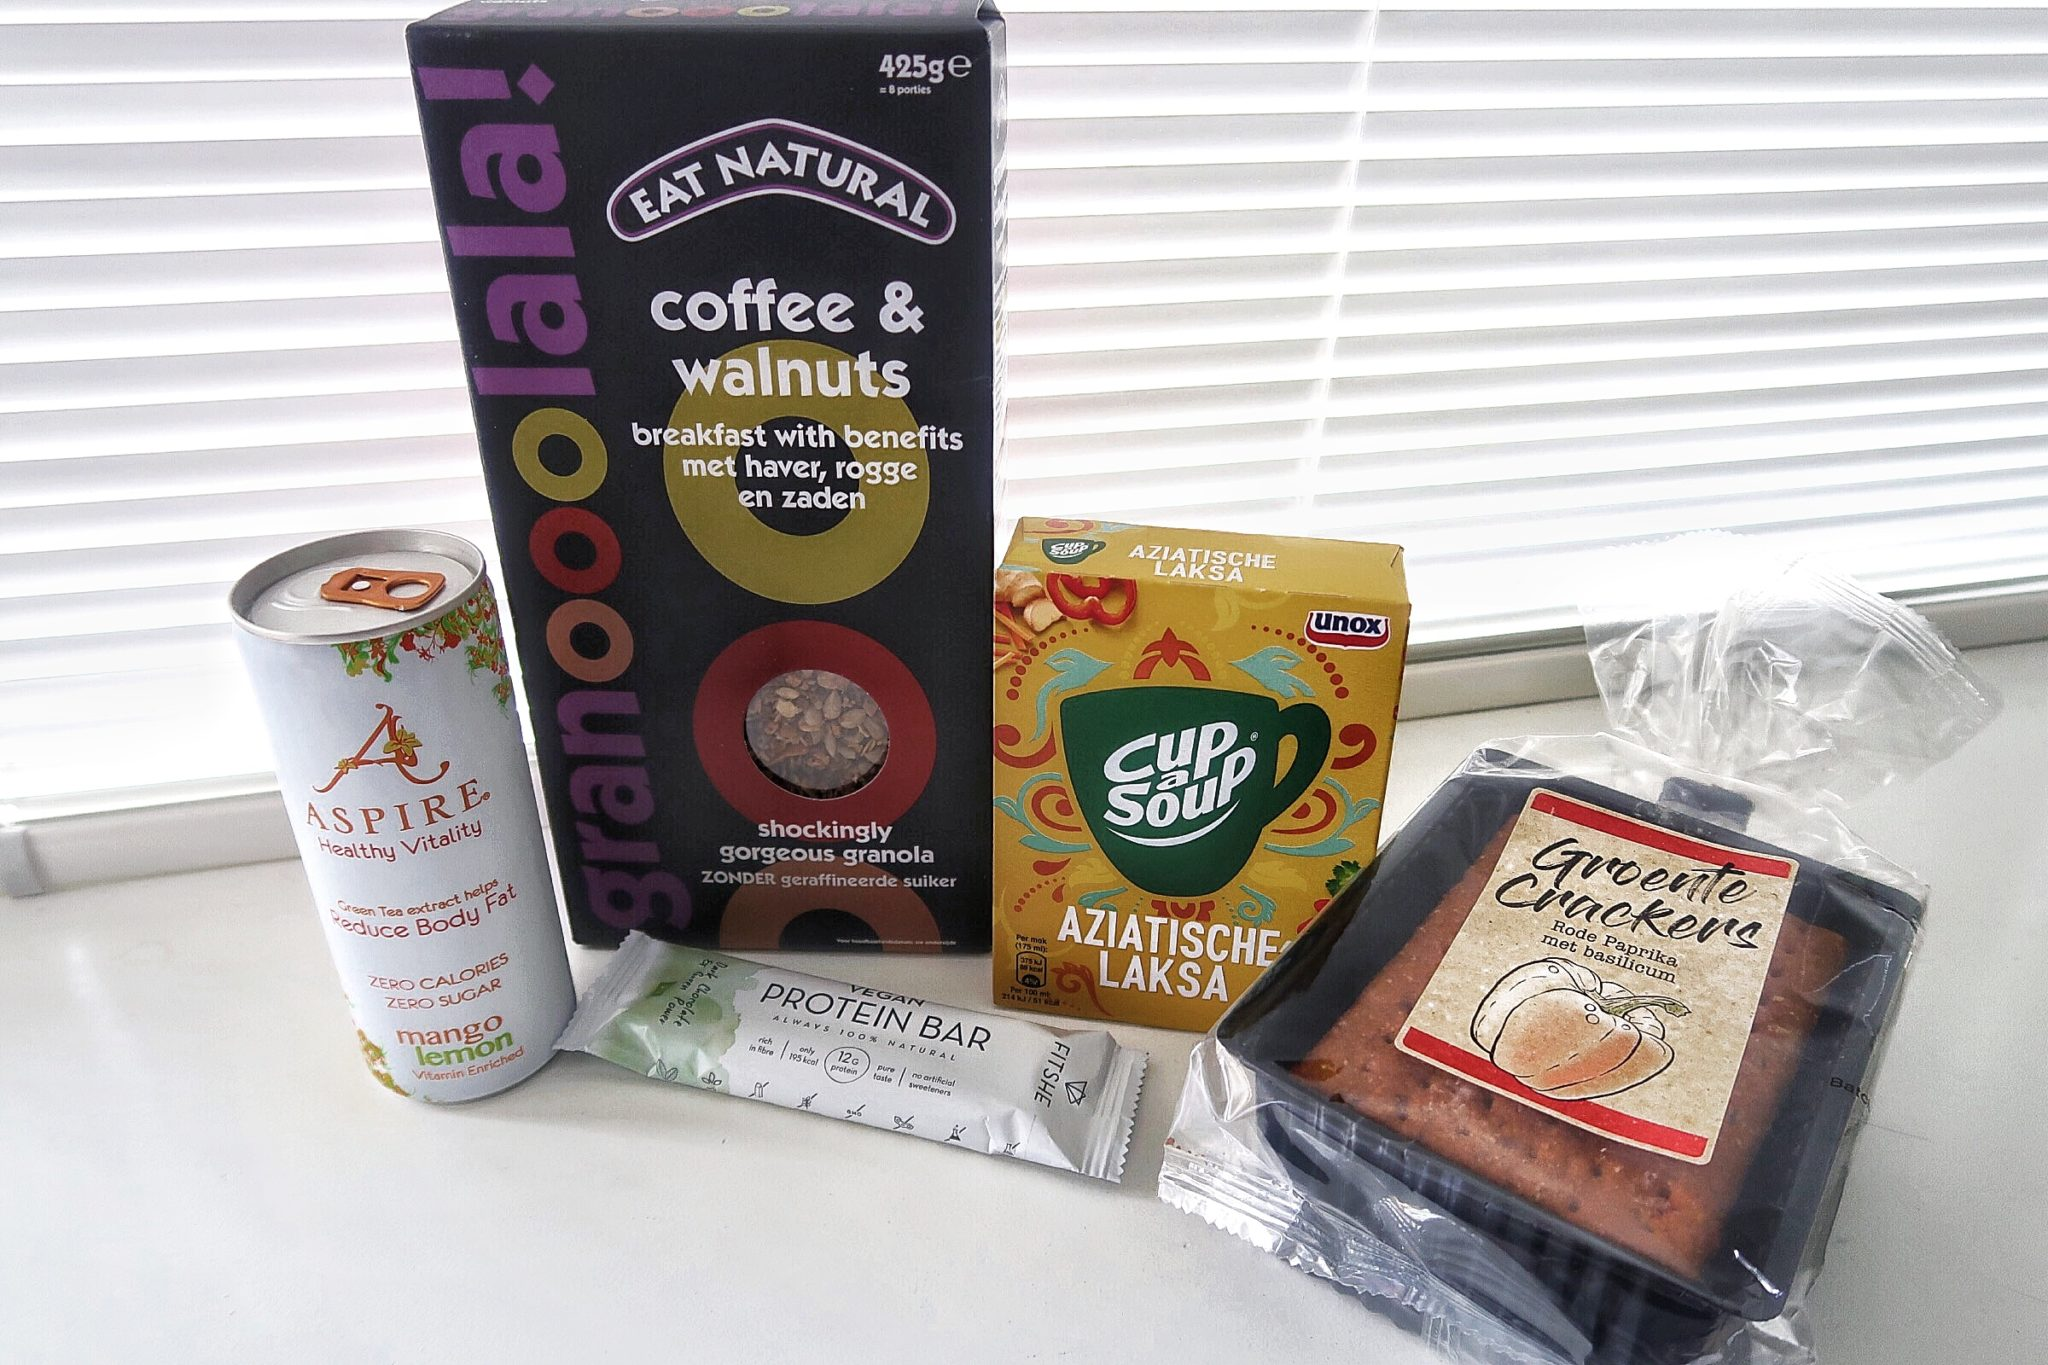 gymjunkie lifestyle plan, gezonde producten, product tips, gezond